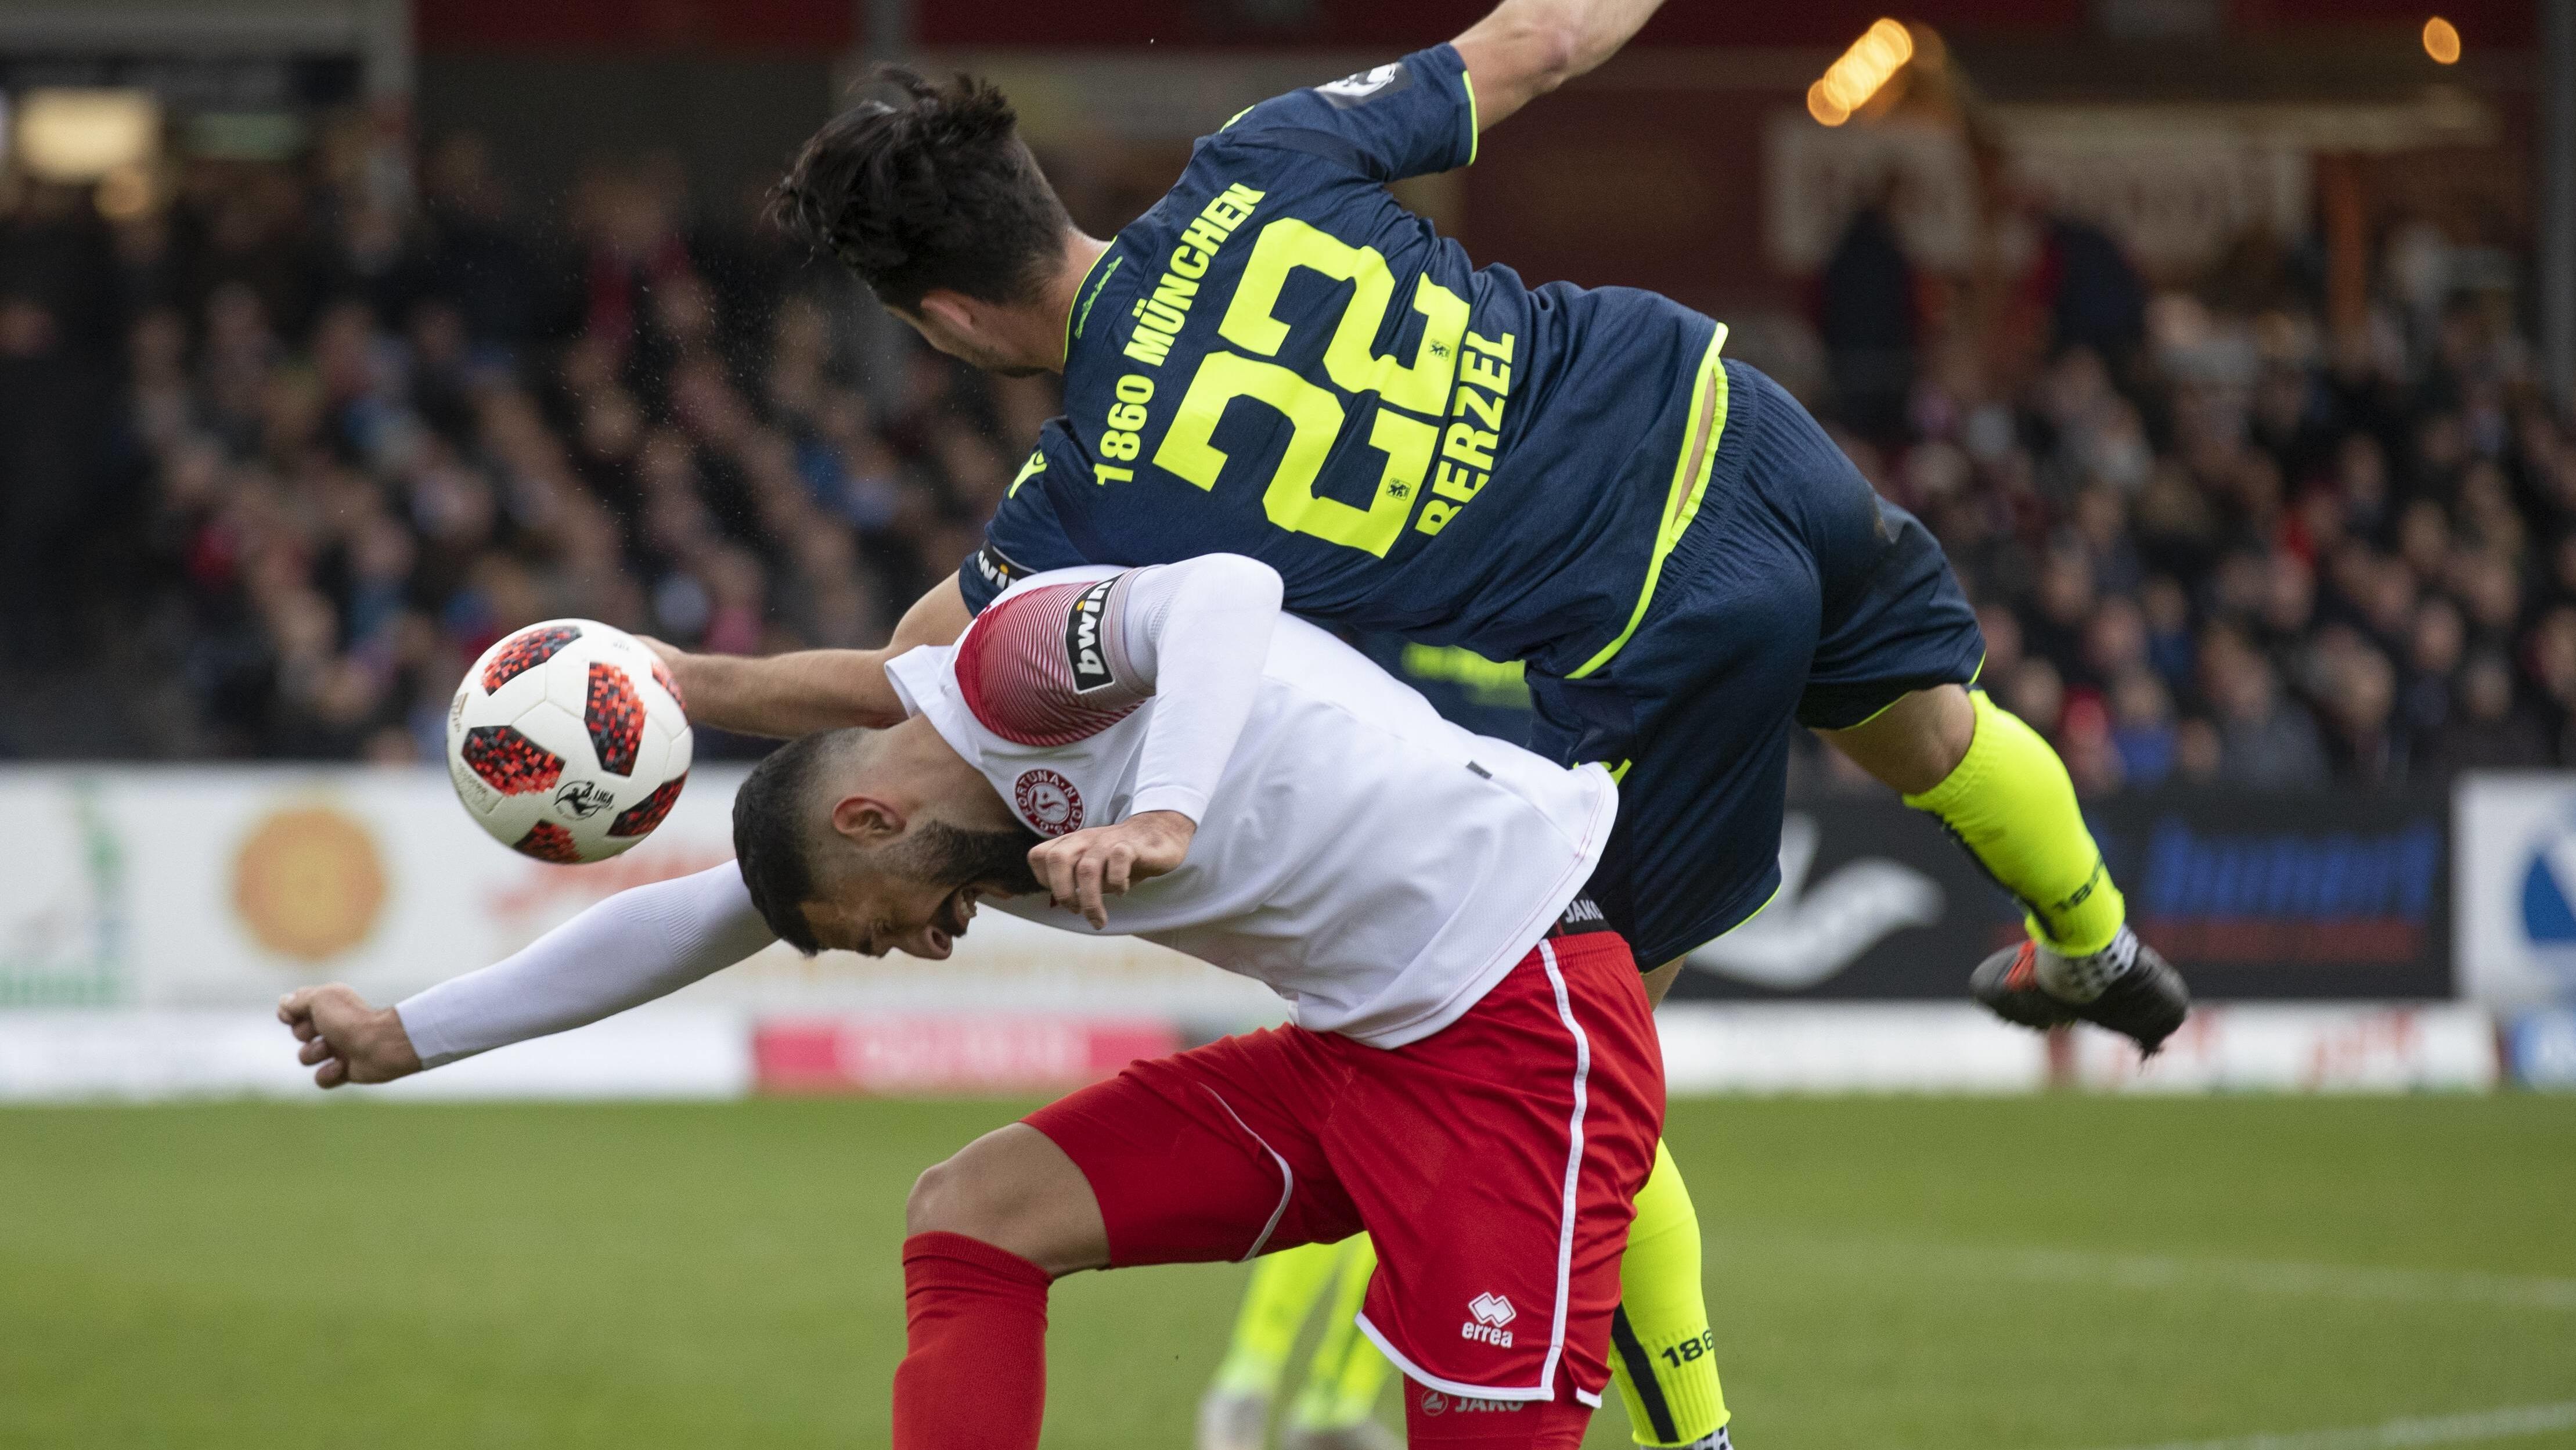 Spielszene Fortuna Köln - TSV 1860 München